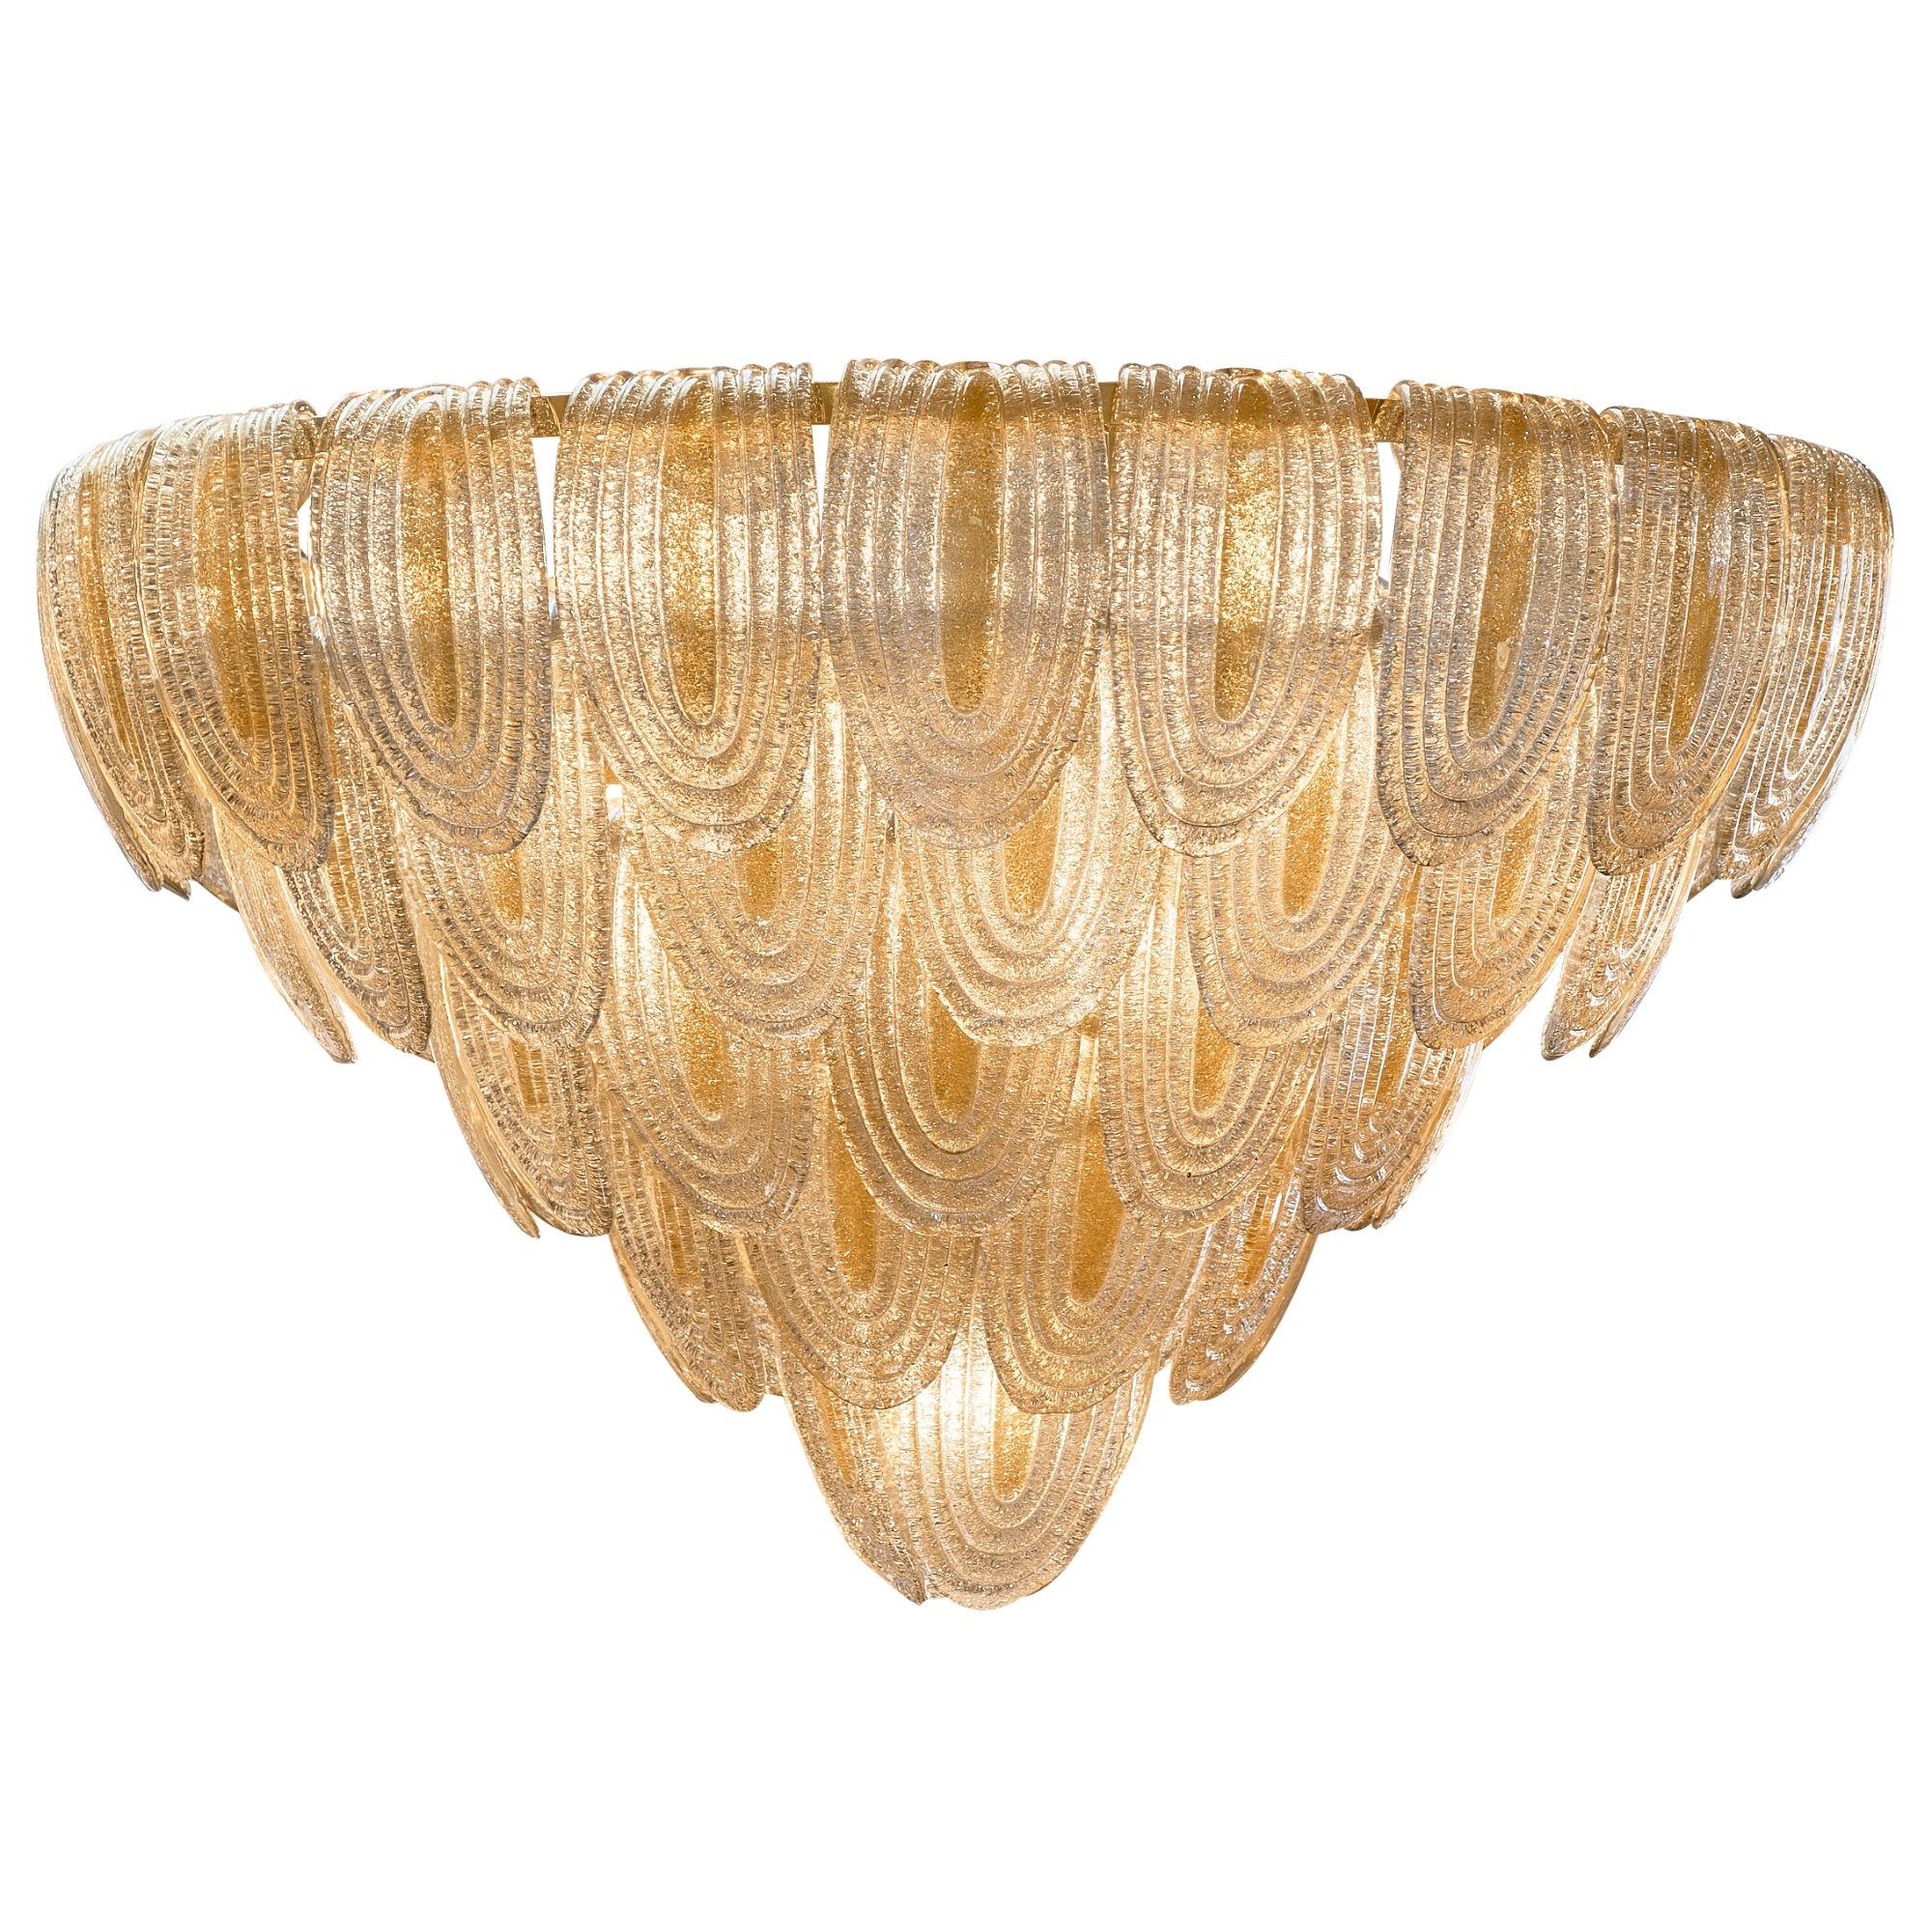 Art Deco Style Murano Glass Chandelier – Jean Marc Fray In Favorite Art Deco Chandelier (View 20 of 20)